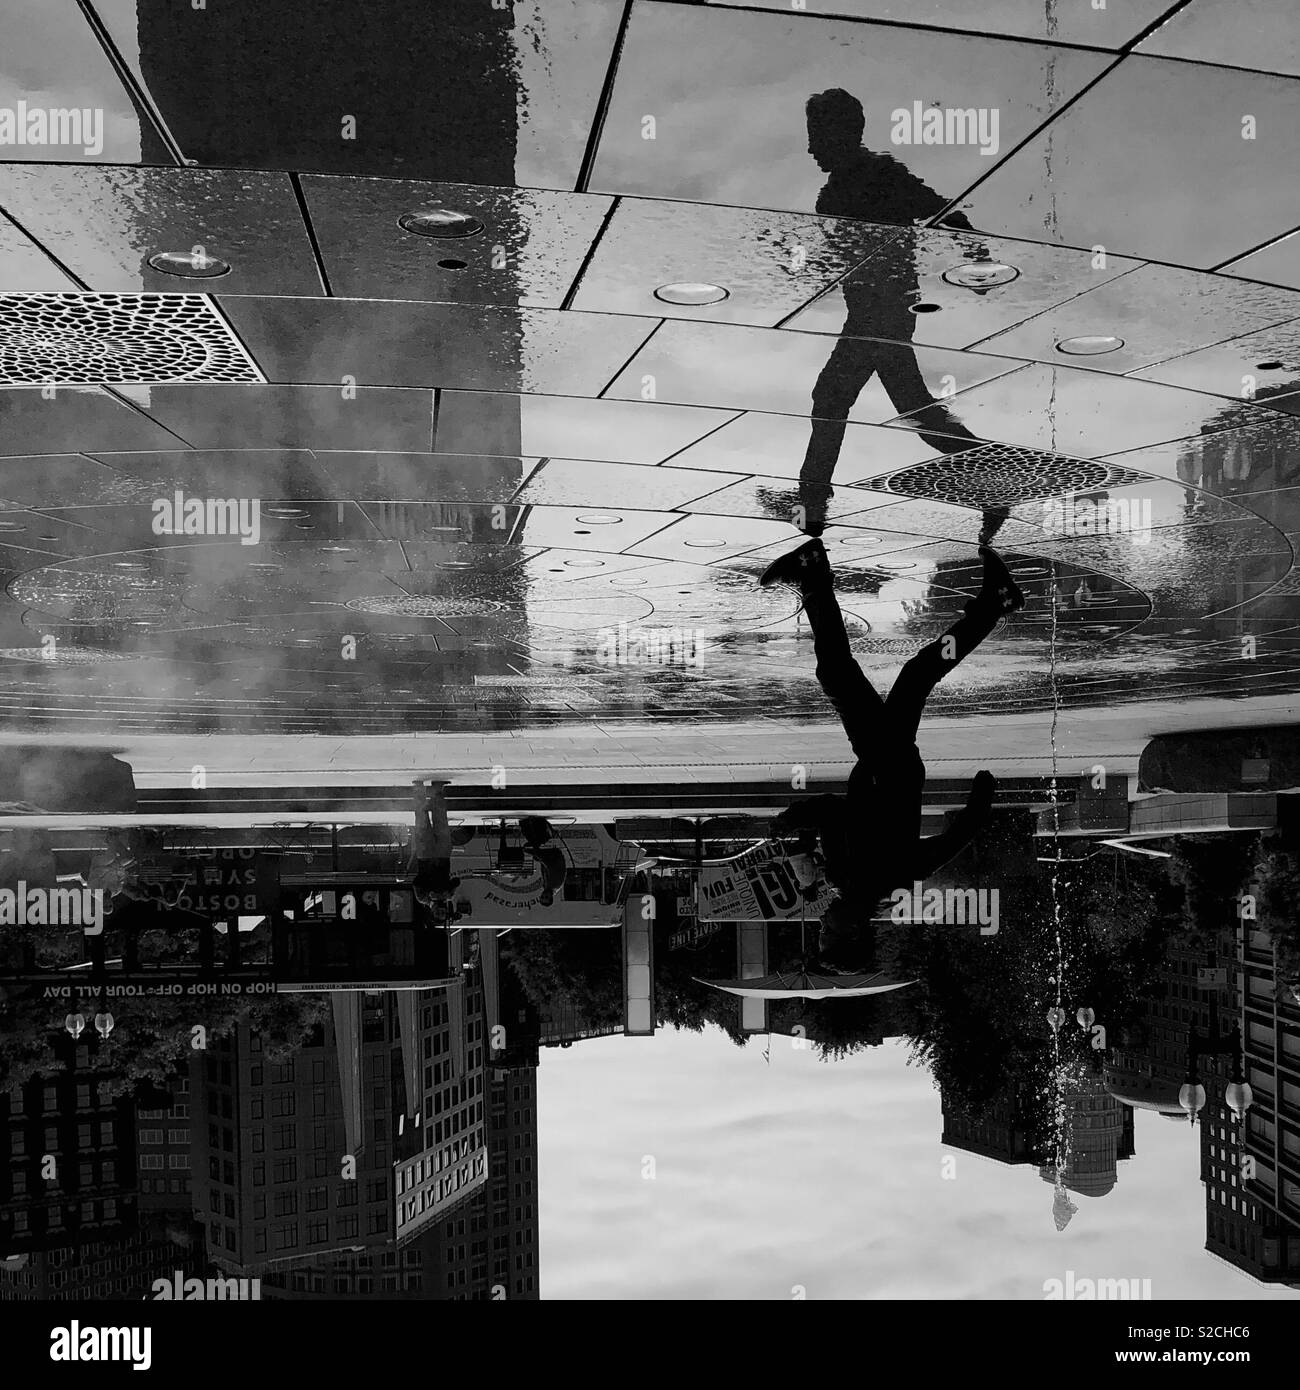 Reflections on Boston - Stock Image